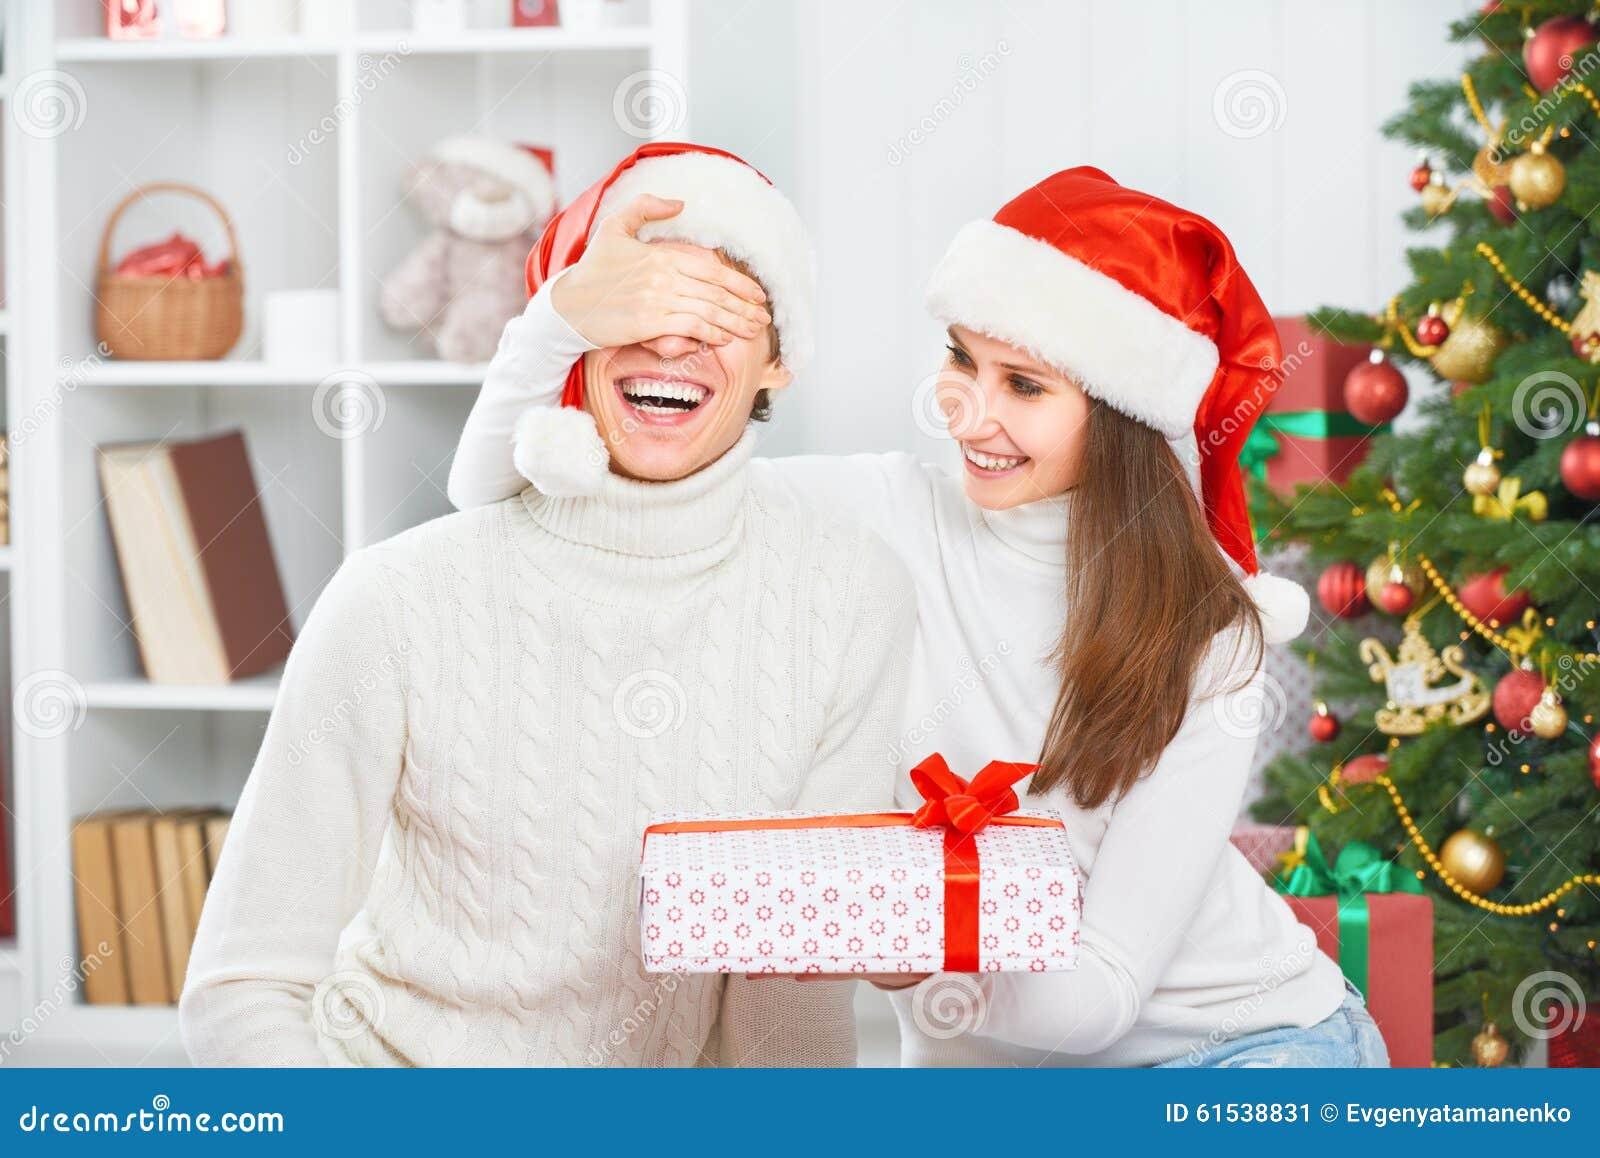 Beautiful Christmas Gift Women Adornment - Christmas Decoration ...